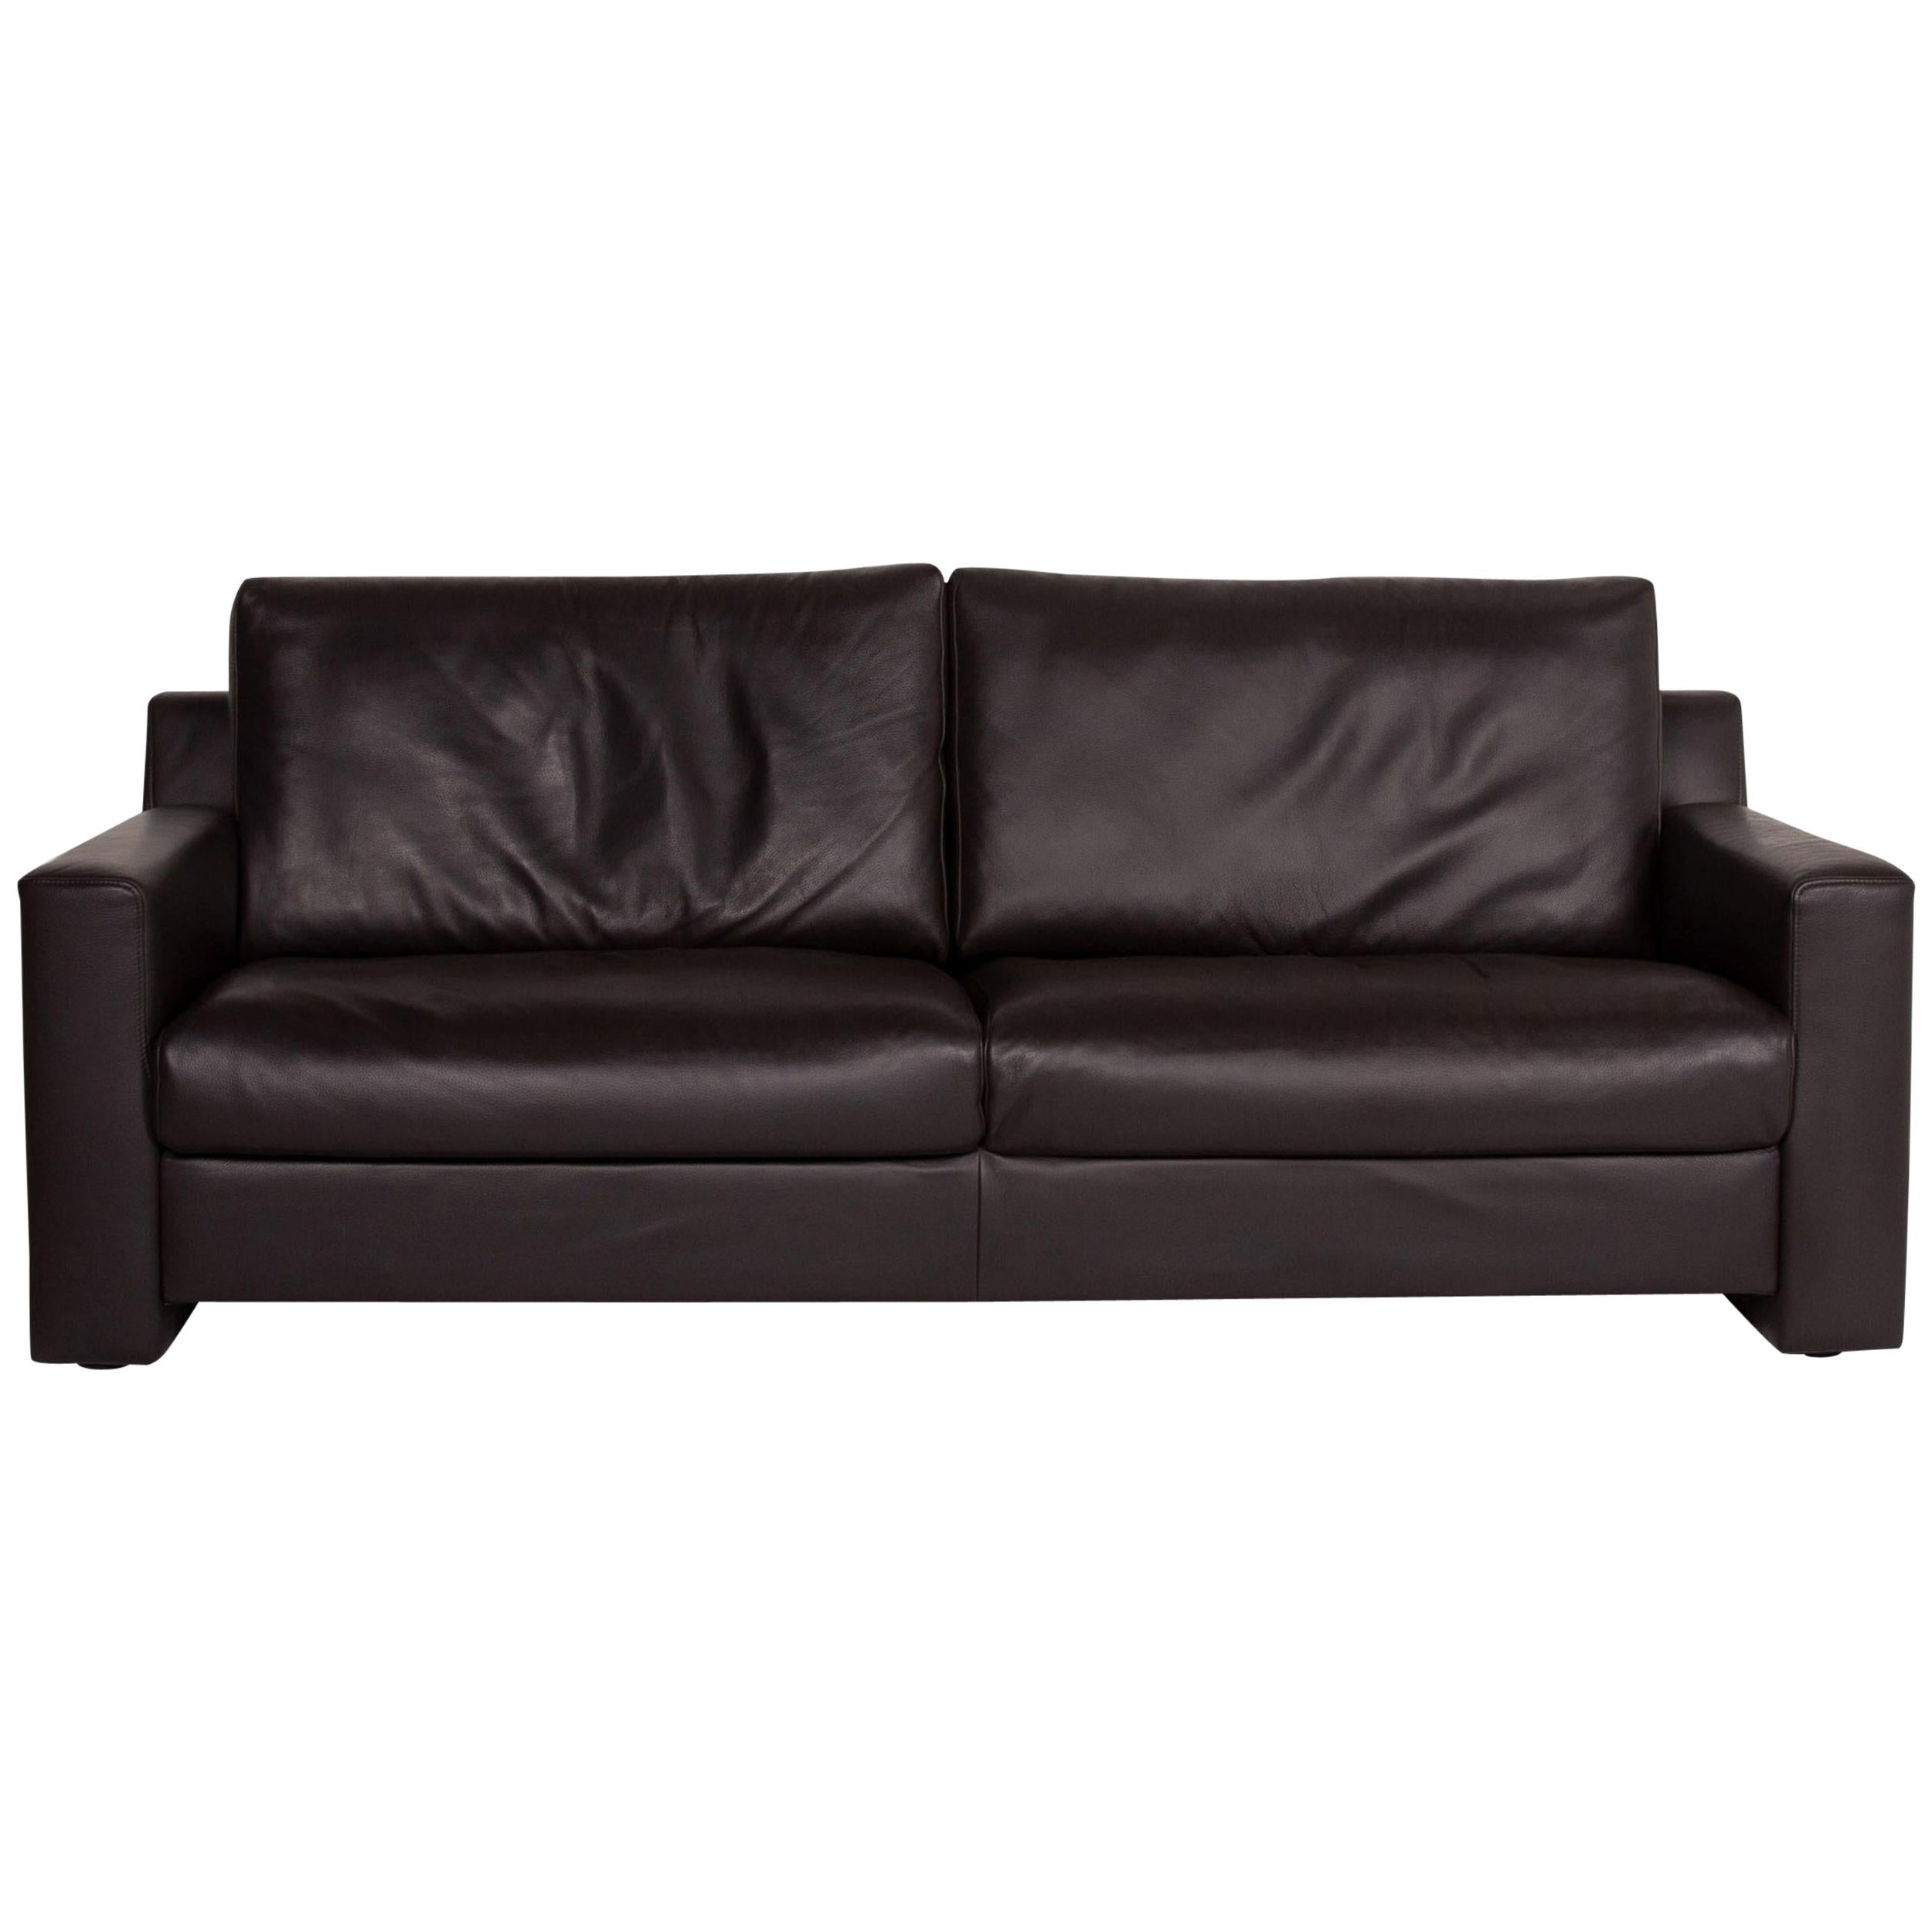 Ewald Schillig Flex Plus Leather Sofa Dark Brown Two-Seat Couch